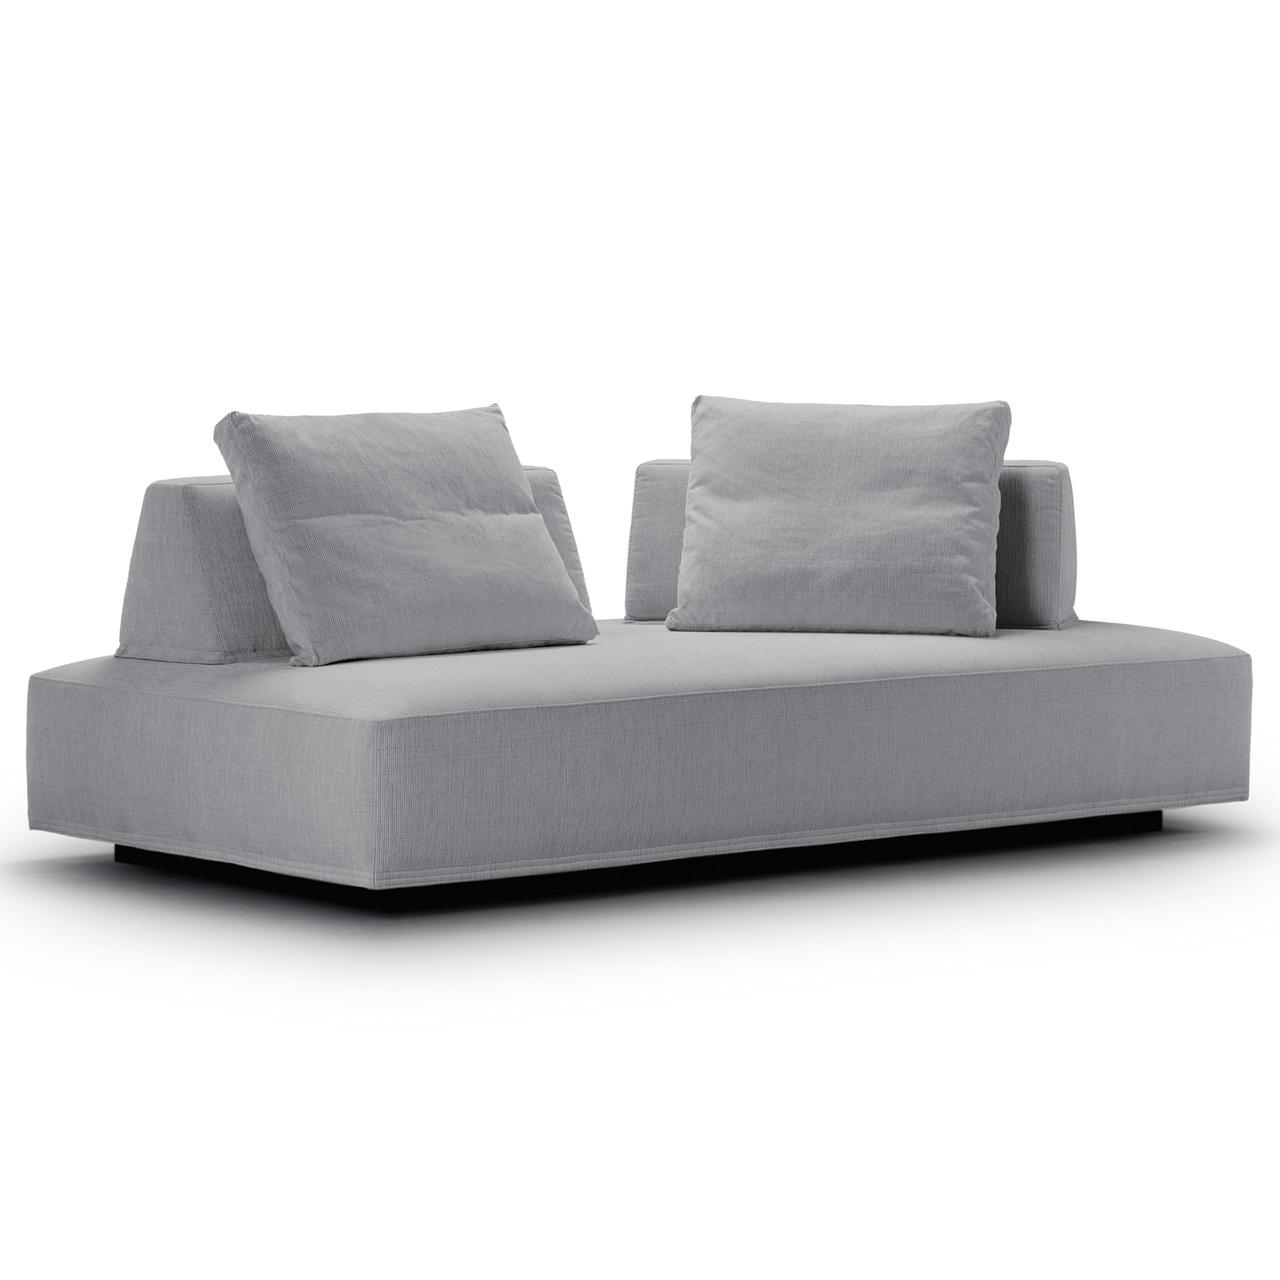 Eilersen Sofa 'Playground' Grau 17 - Herring, B: 200 cm / T: 130 cm